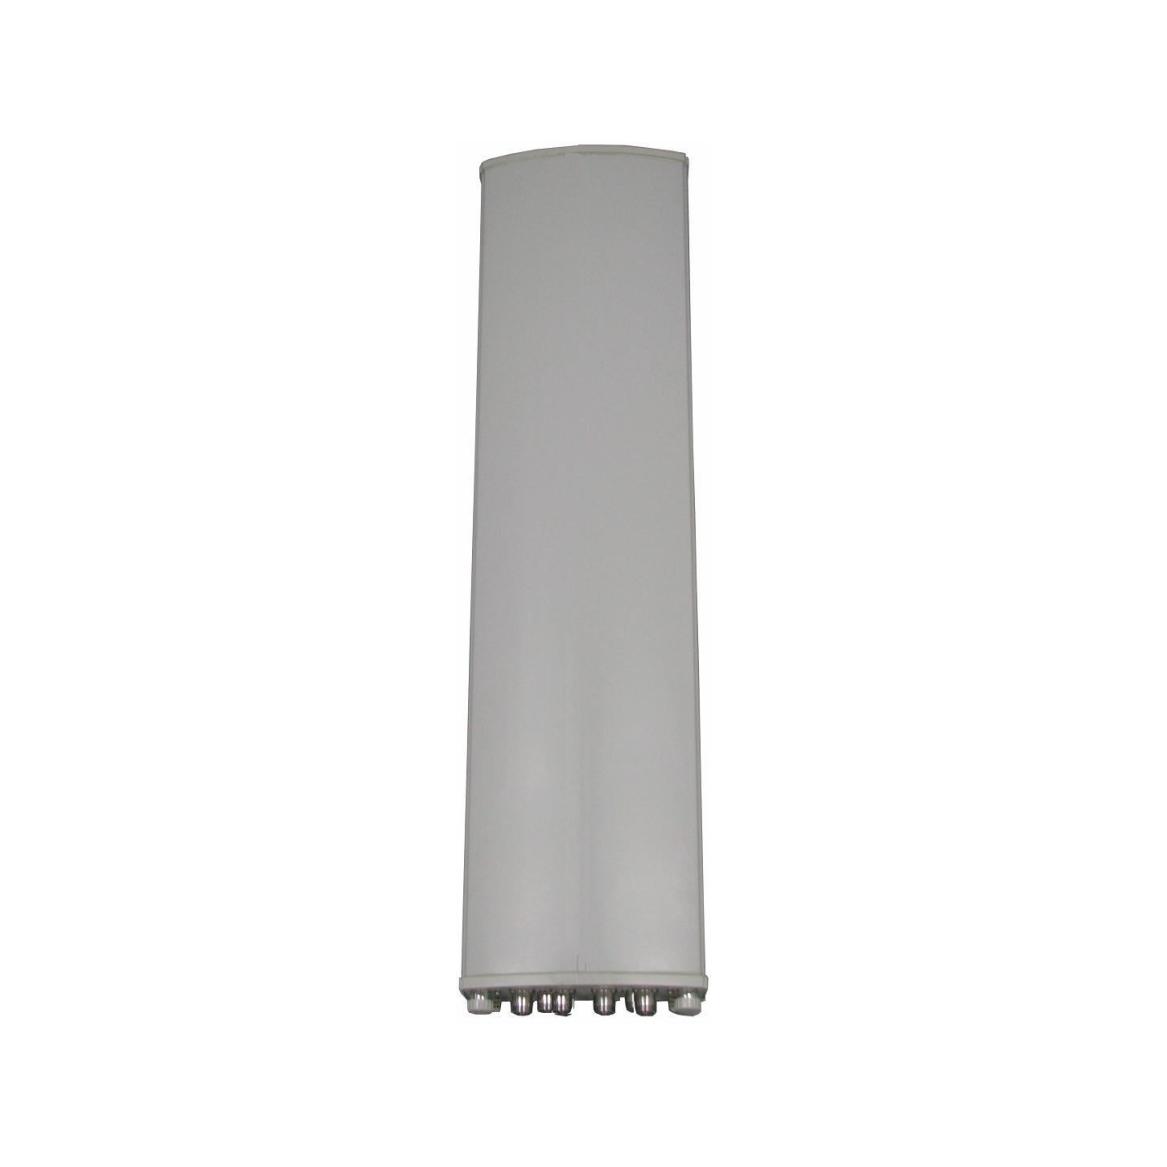 Antena Painel Setorial 15-16.5dBi 806-960/1710-2170 MHz